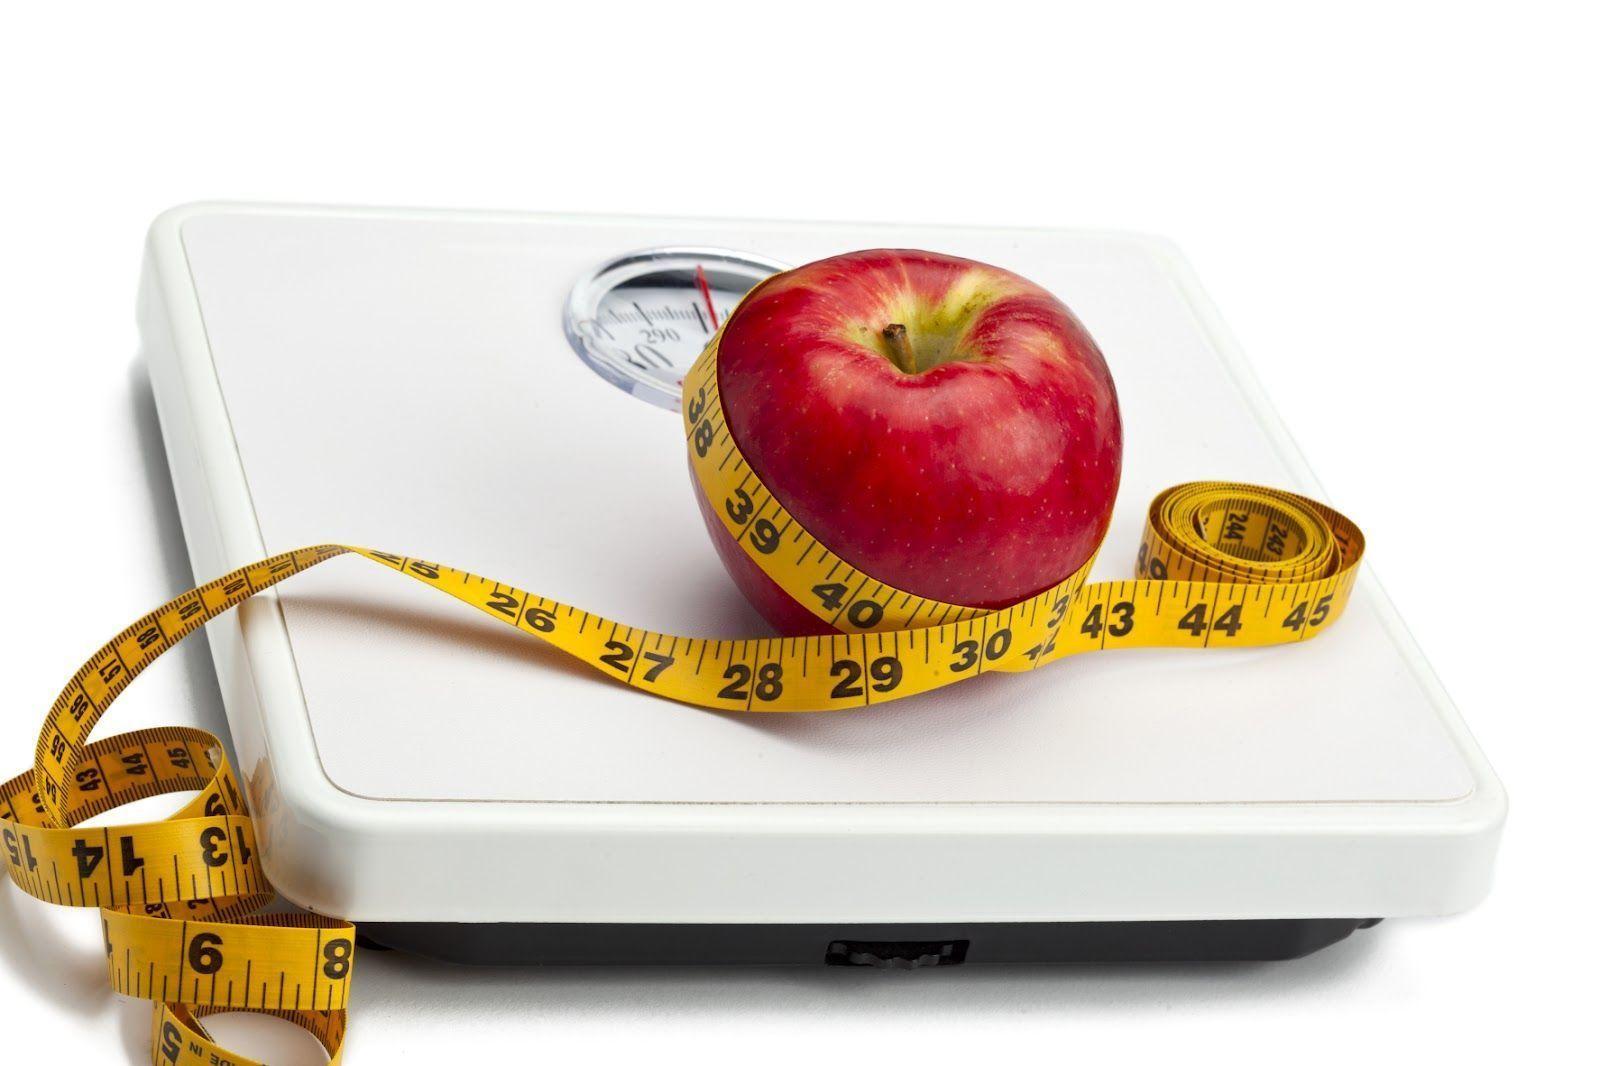 dietas-extremas-a-tu-salud